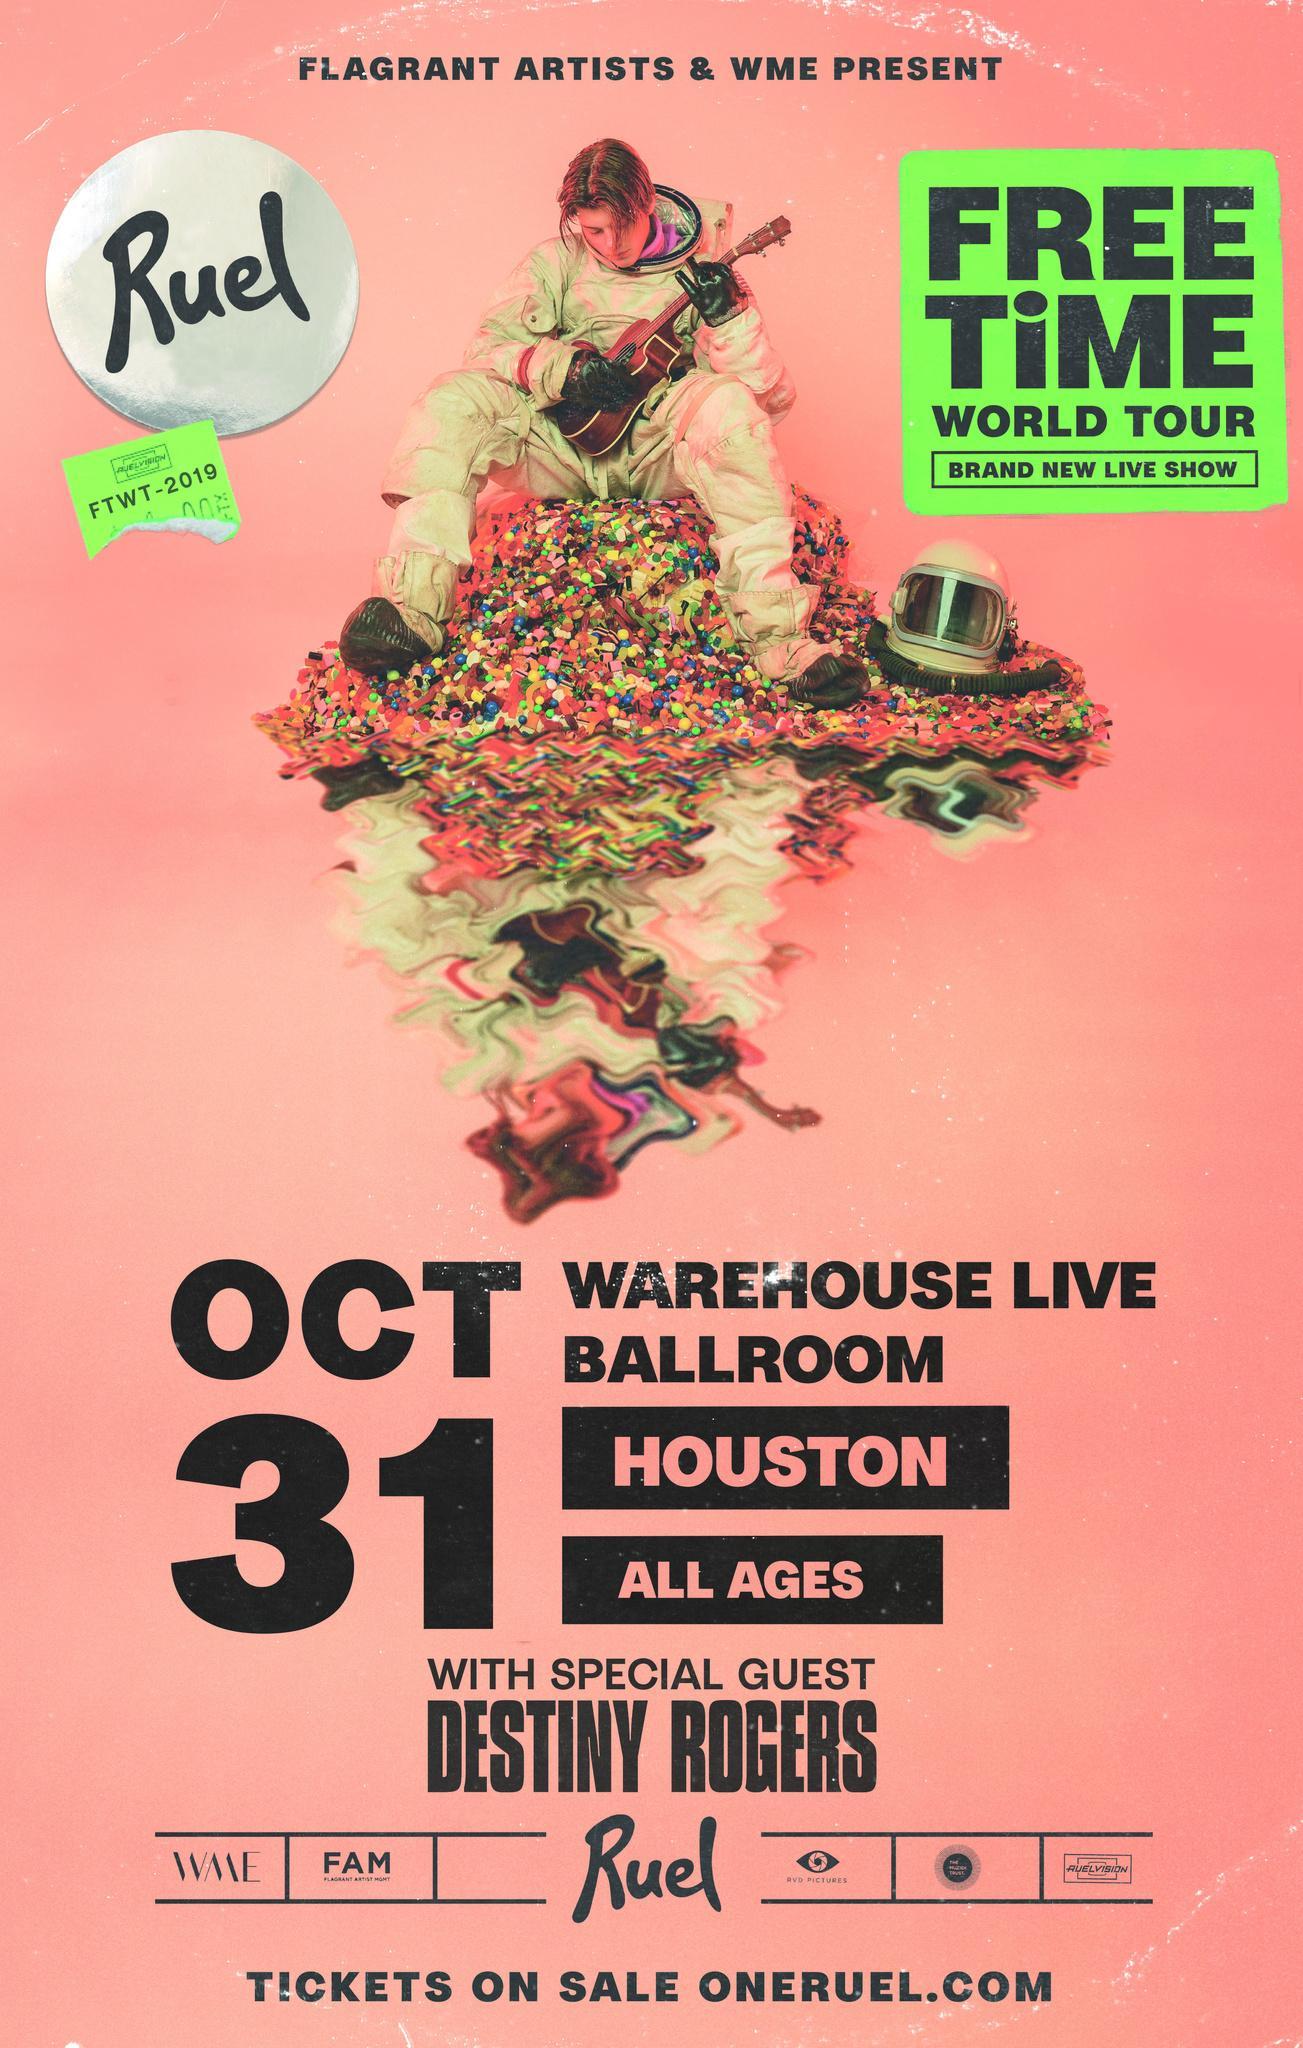 RUEL - FREE TIME WORLD TOUR